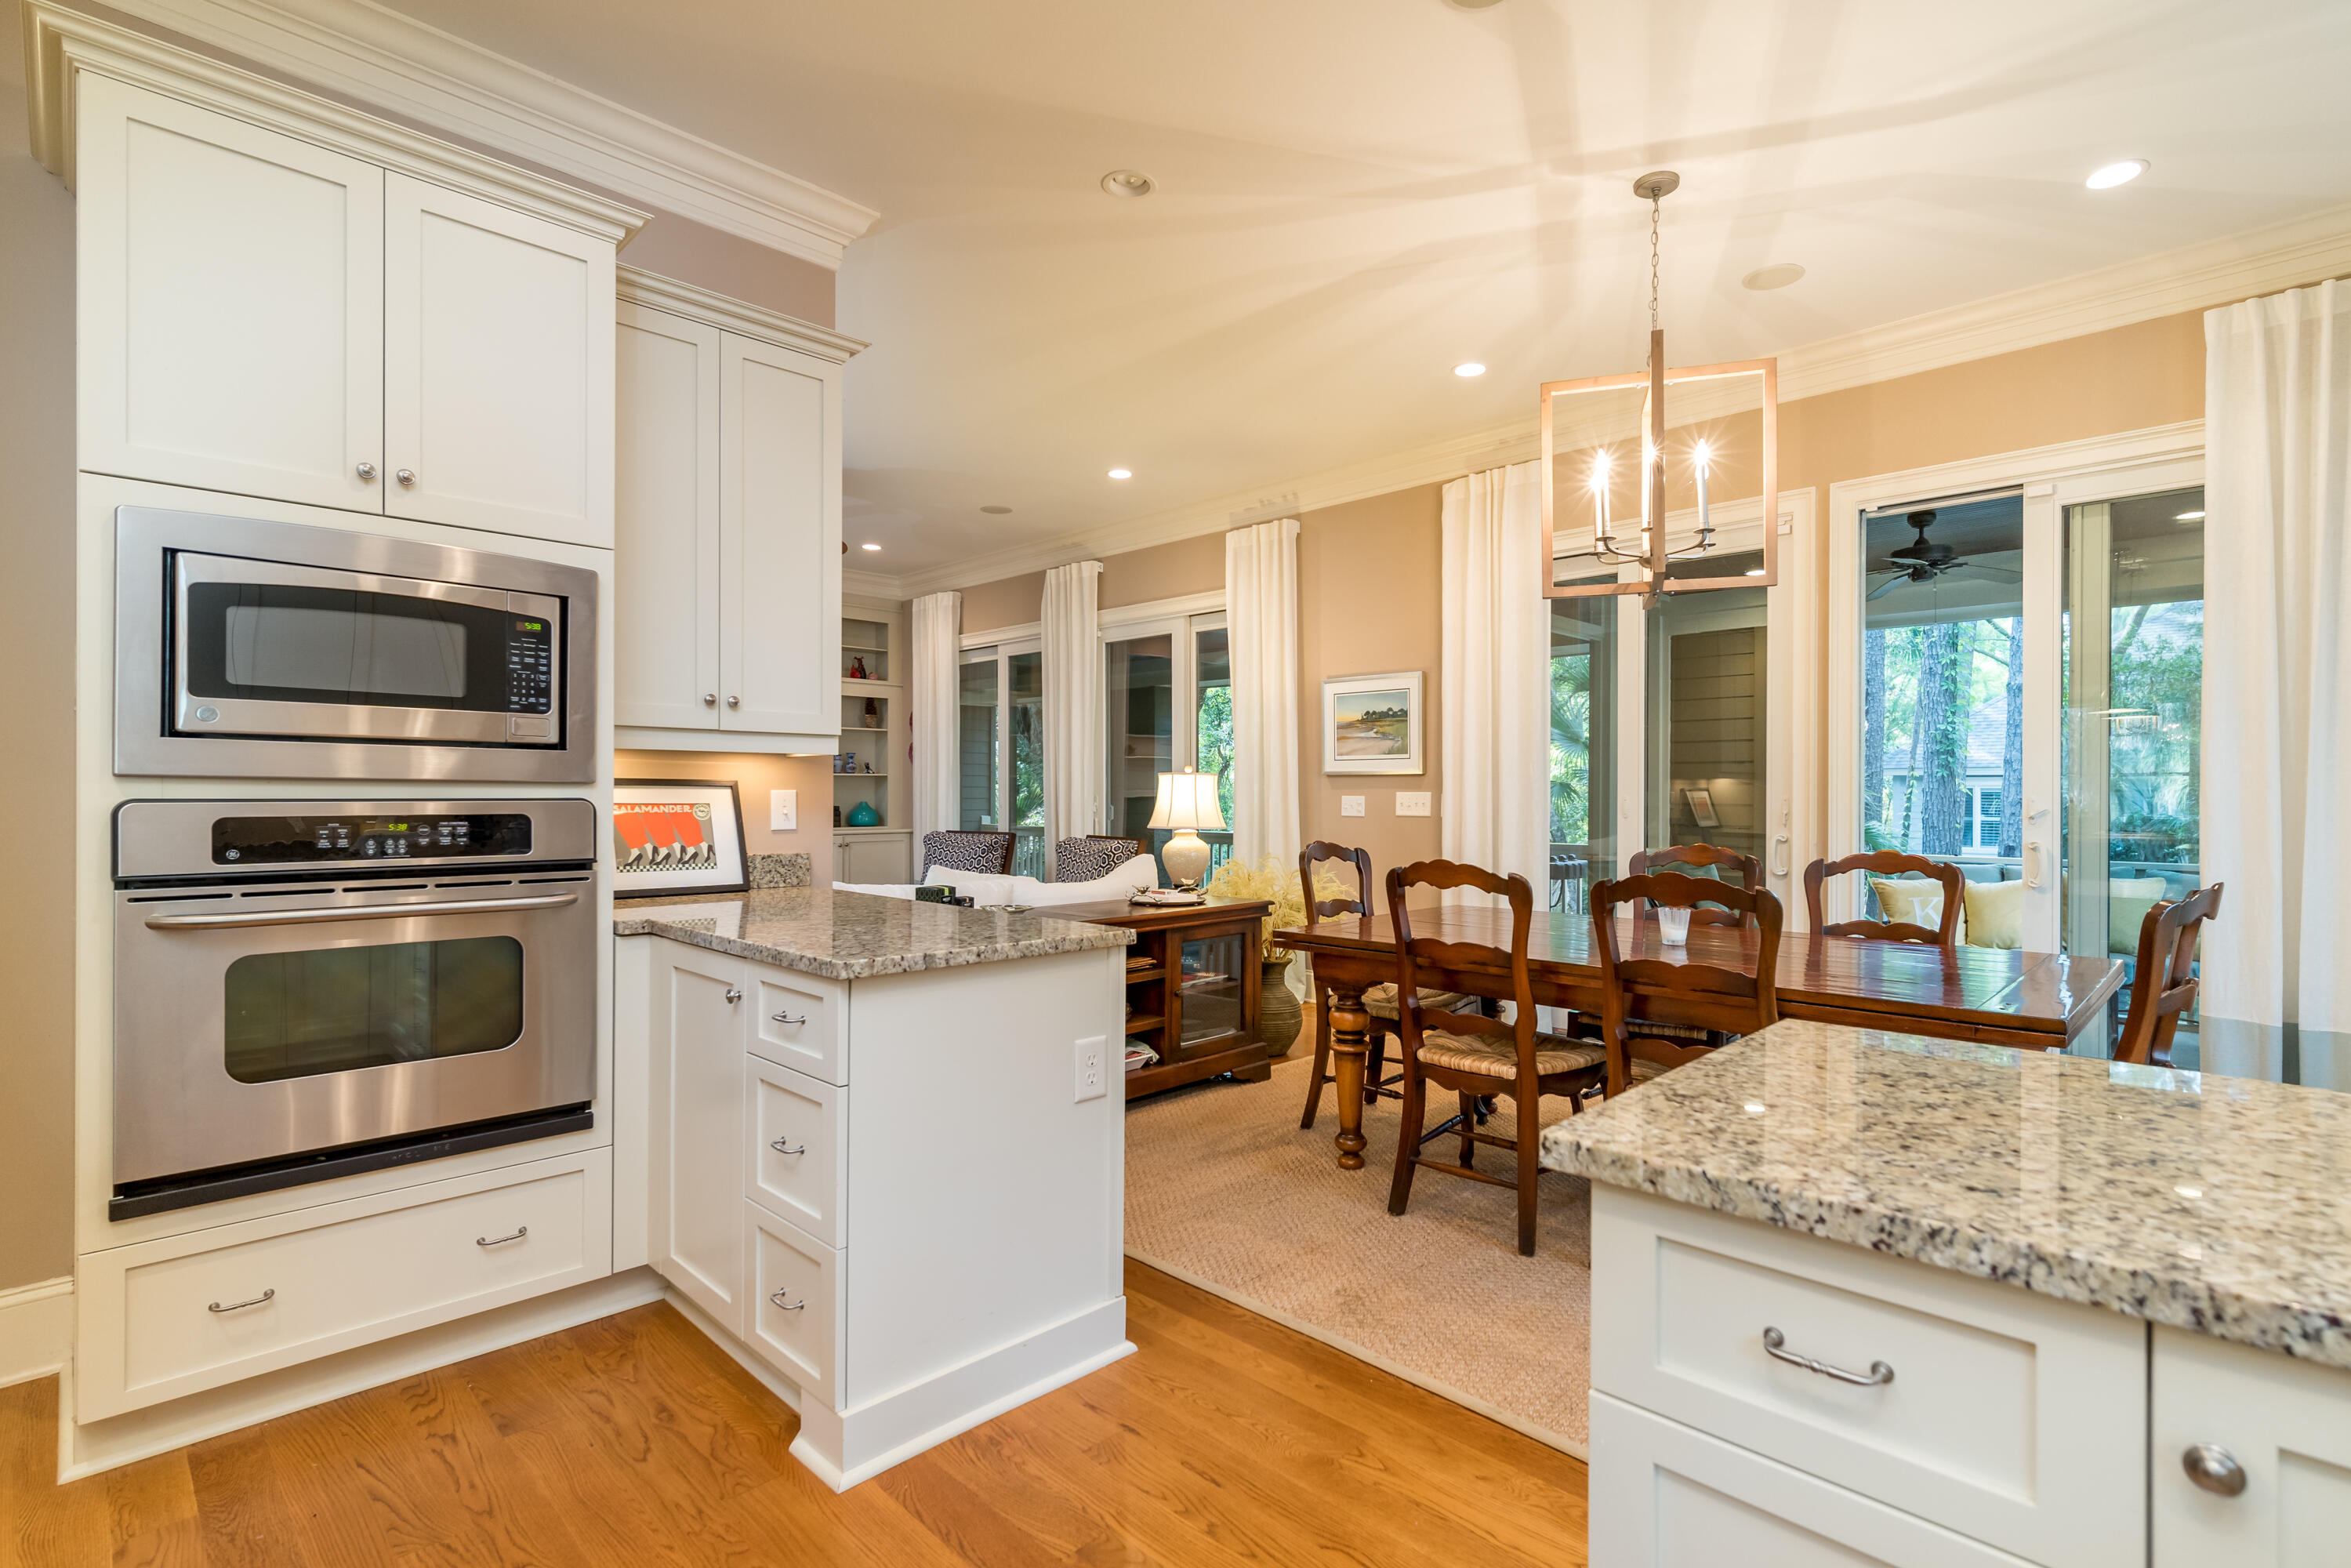 Marsh Island Woods 427 Homes For Sale - 74 Governors, Kiawah Island, SC - 29